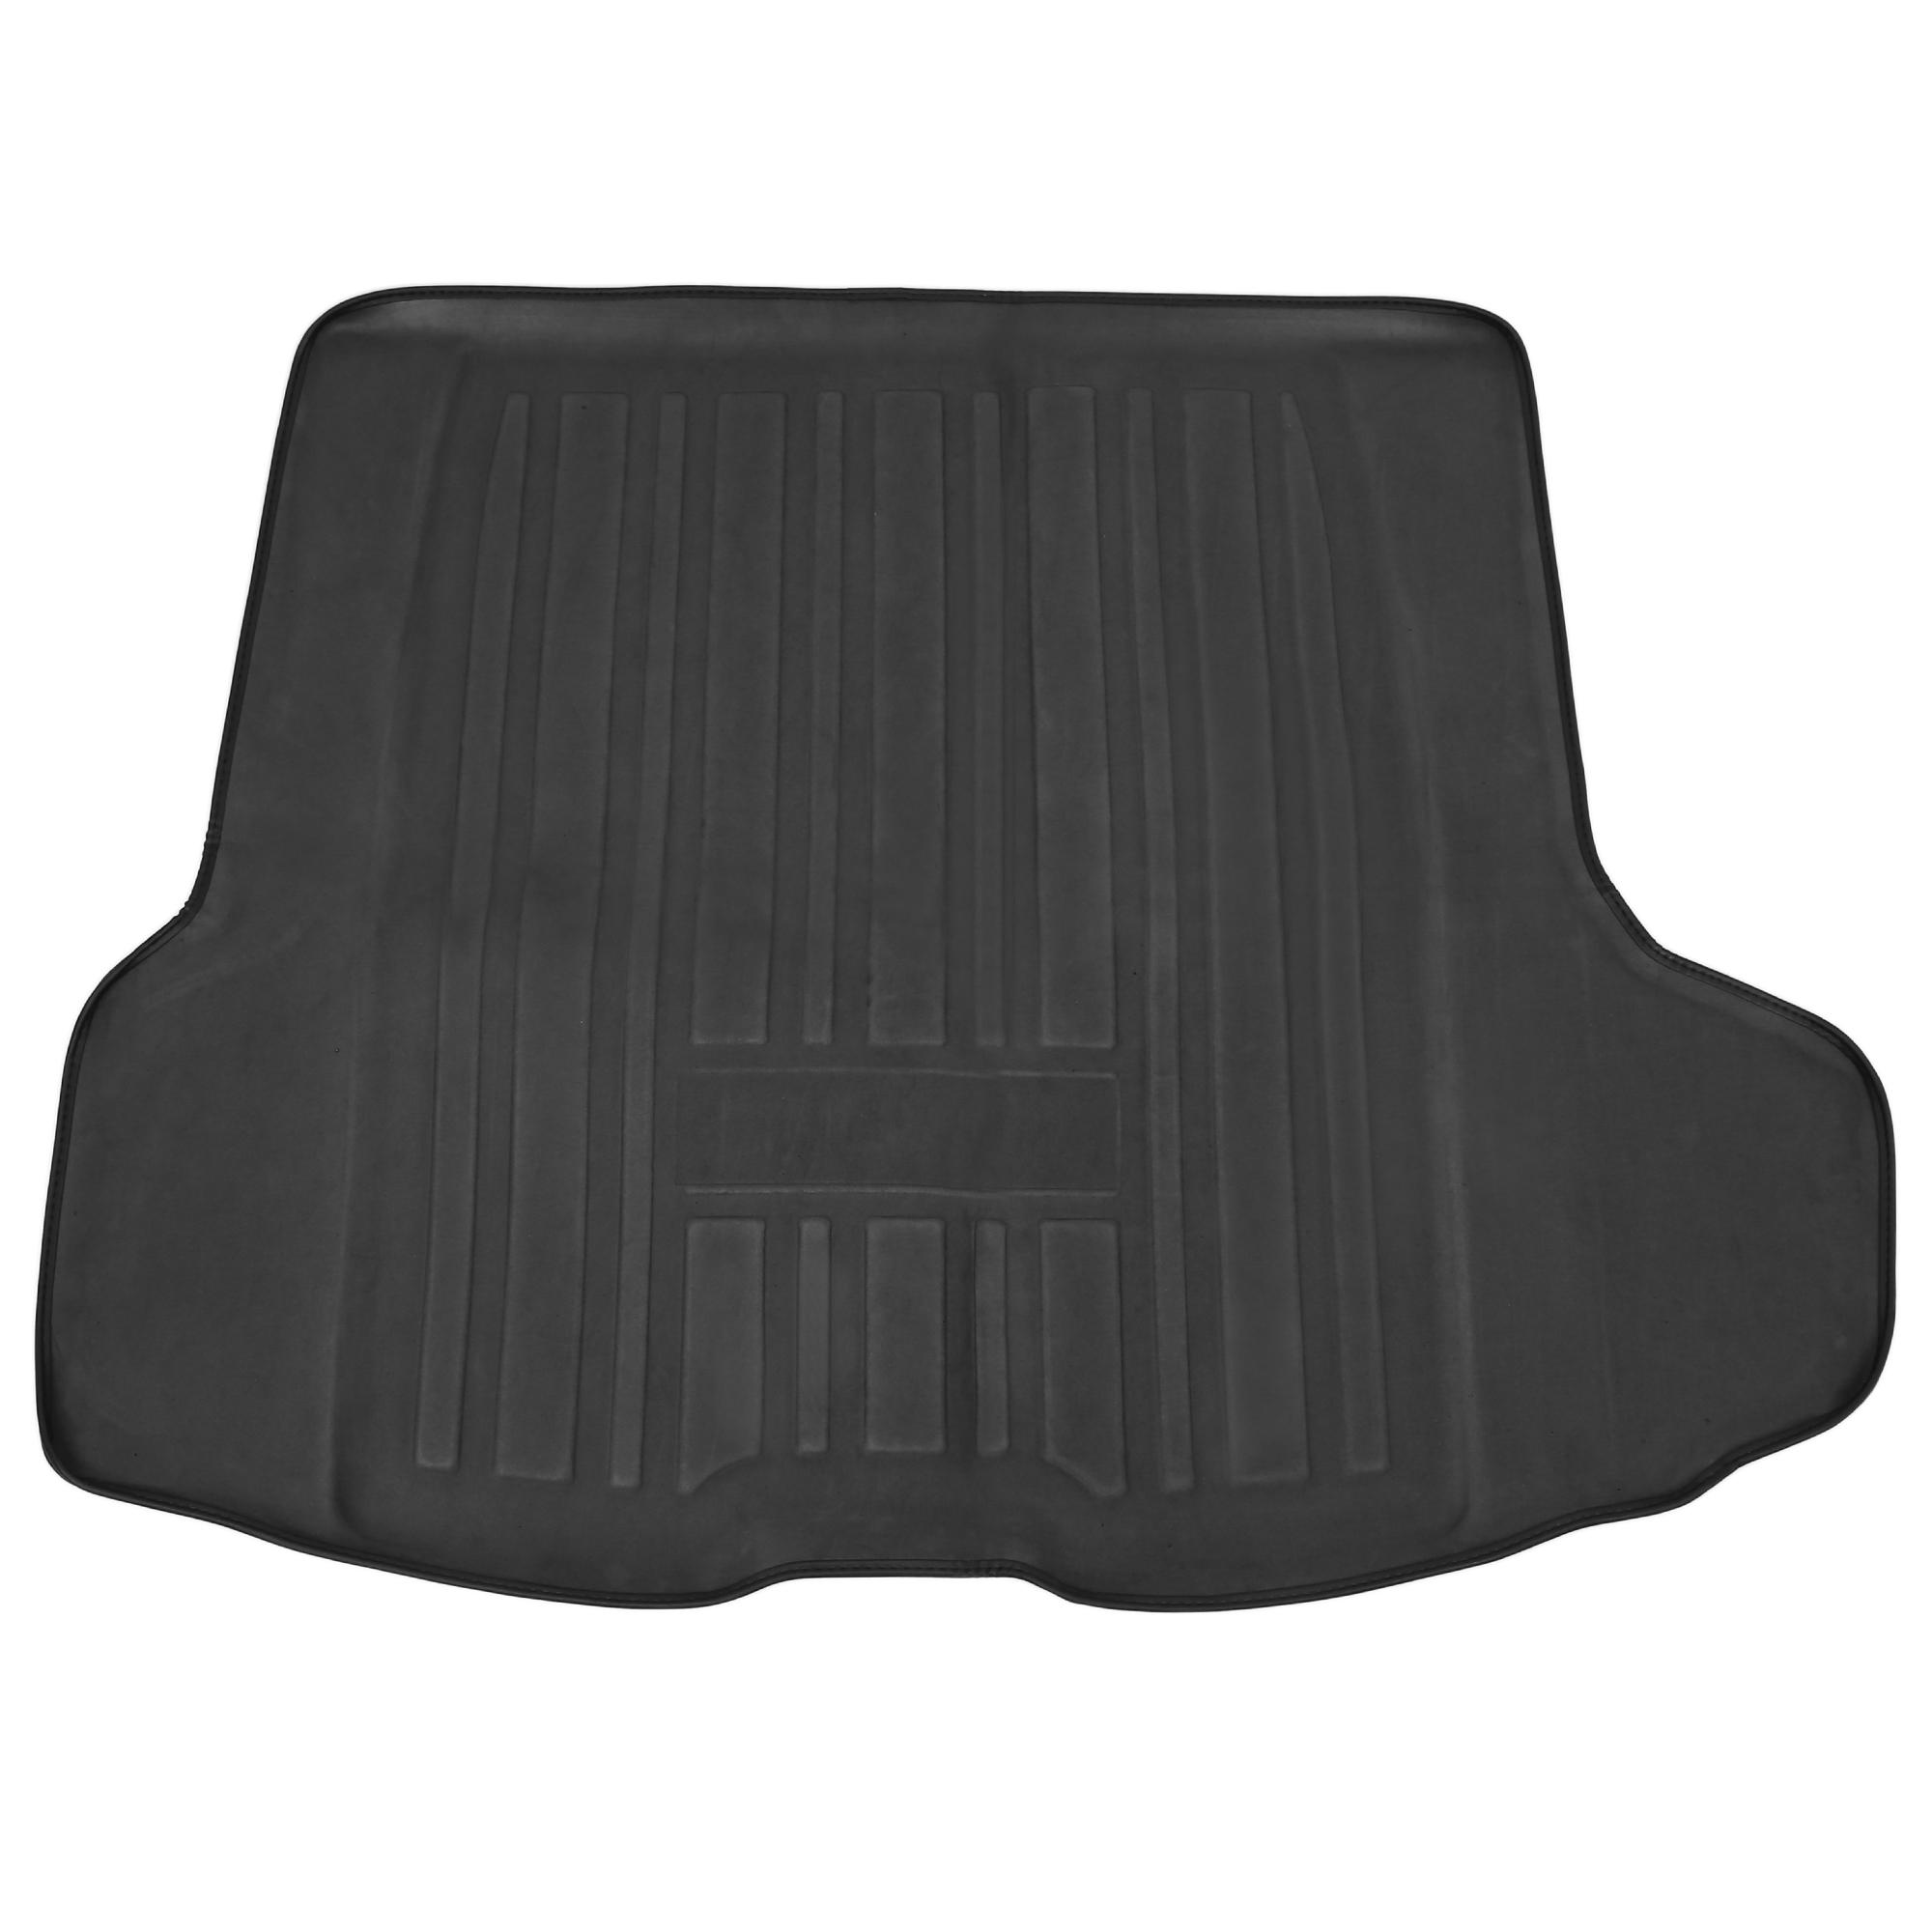 Car Trunk Cargo Mat Rear Trunk Liner Floor Pad for BMW 4 Series 4 Doors 5 Seats